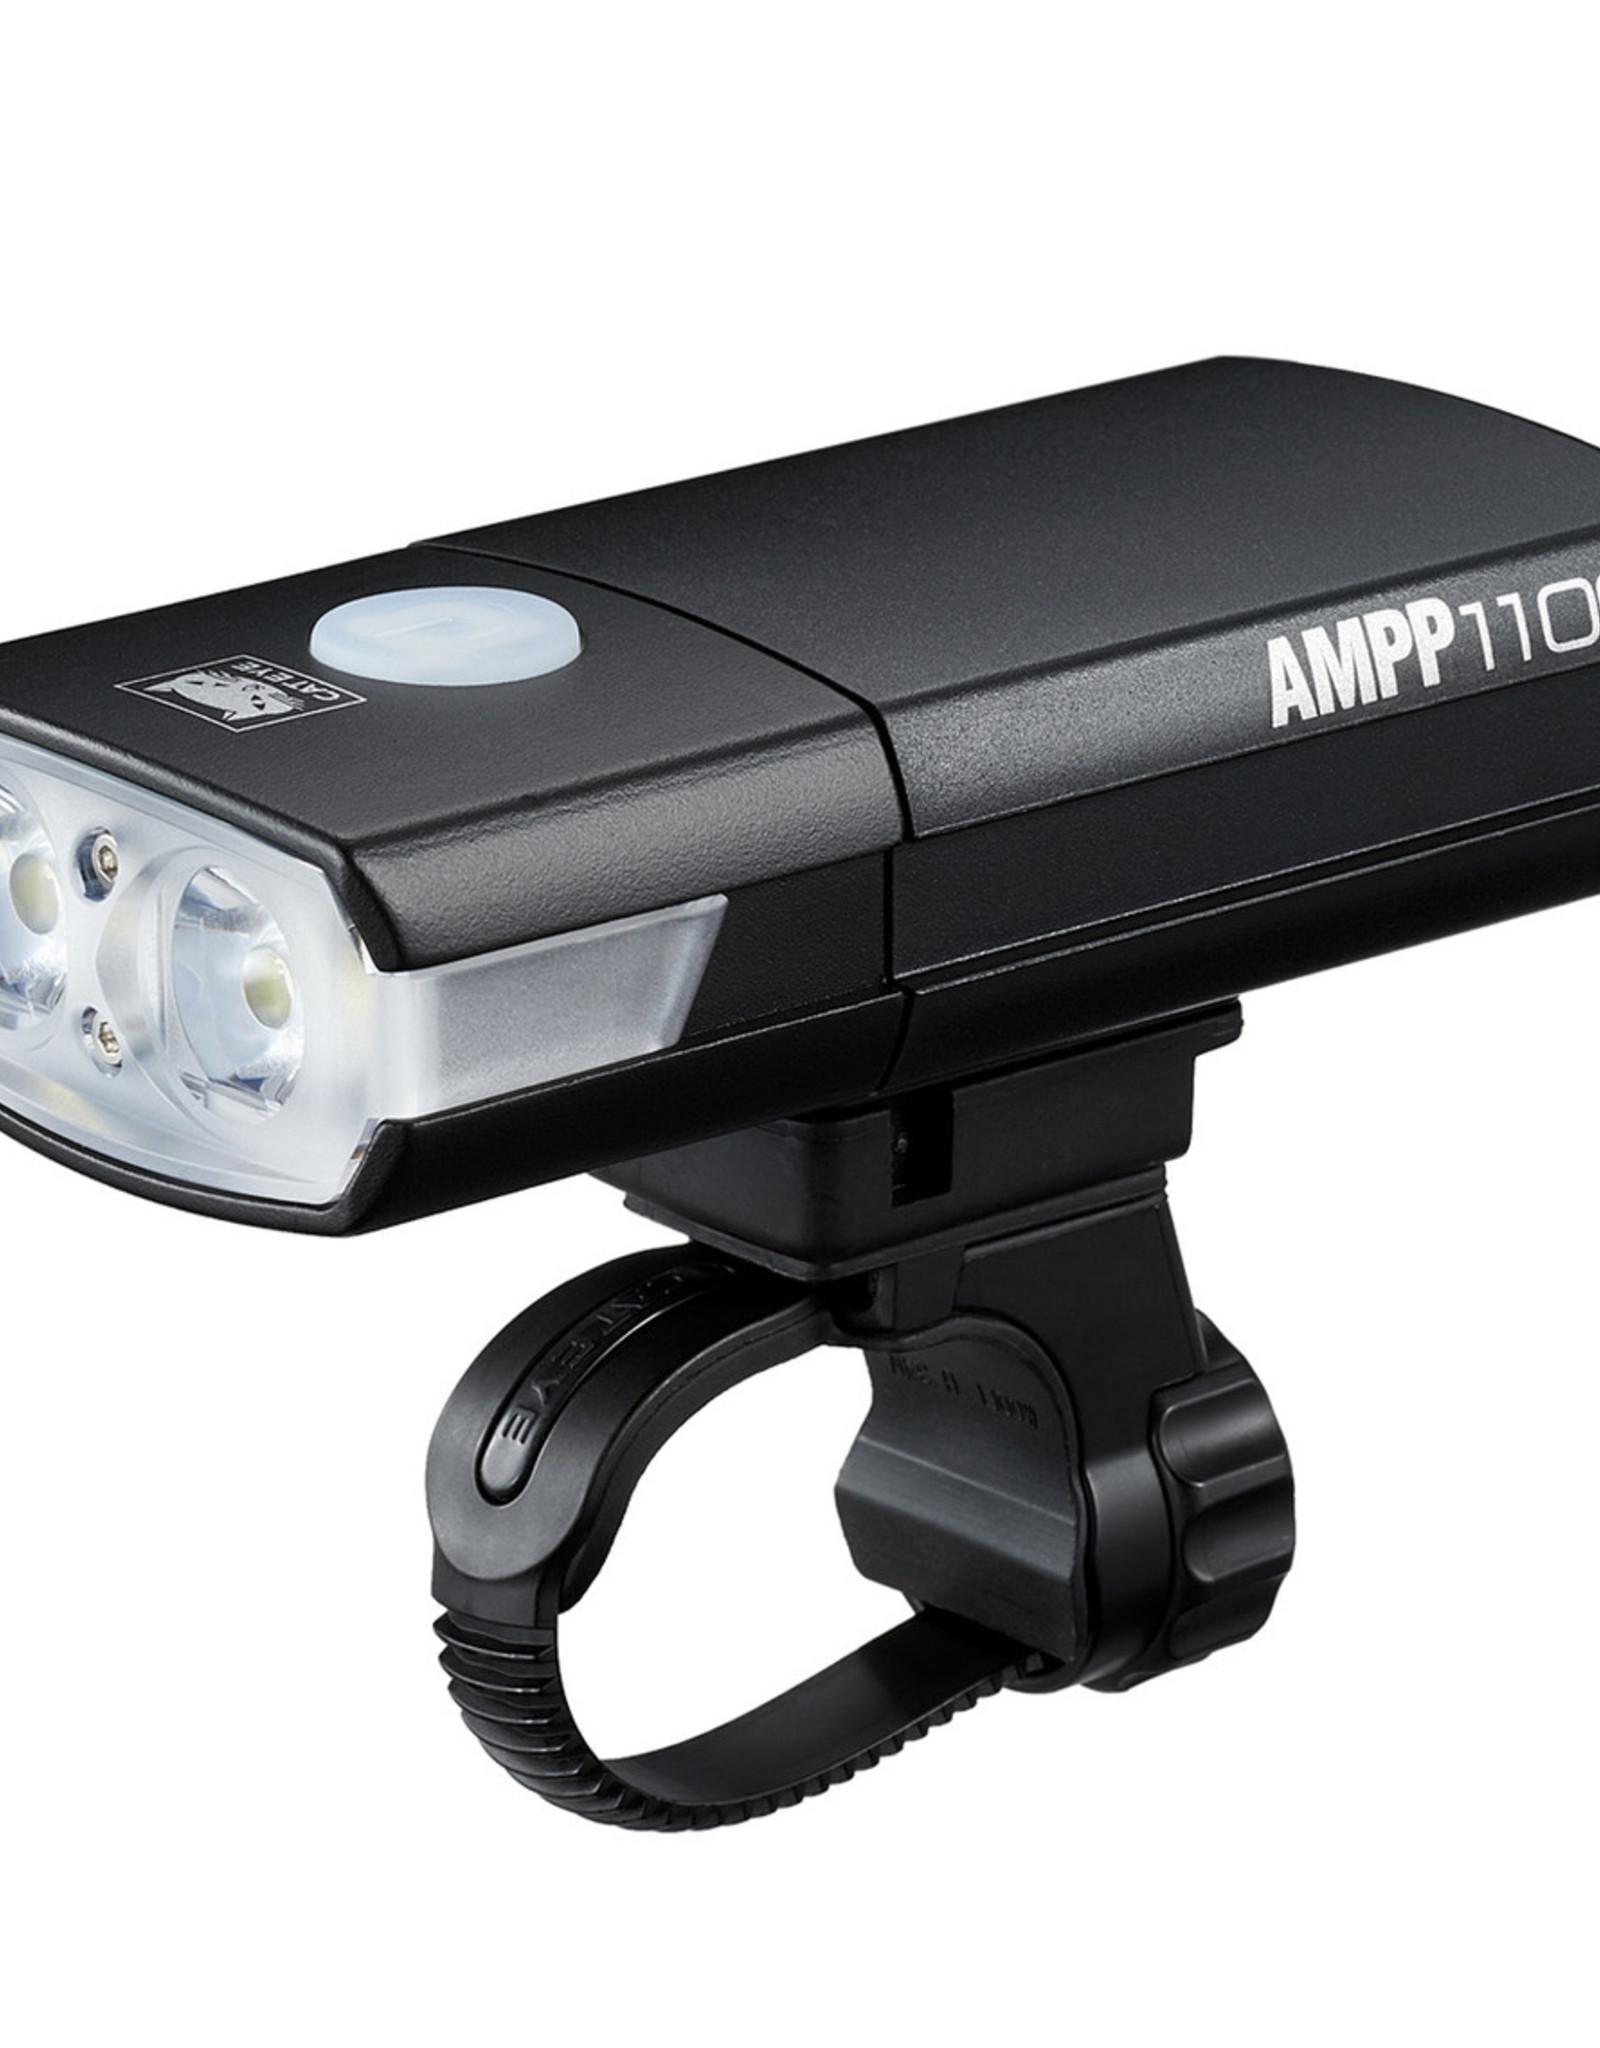 CatEye CatEye Ampp Series LED Headlights